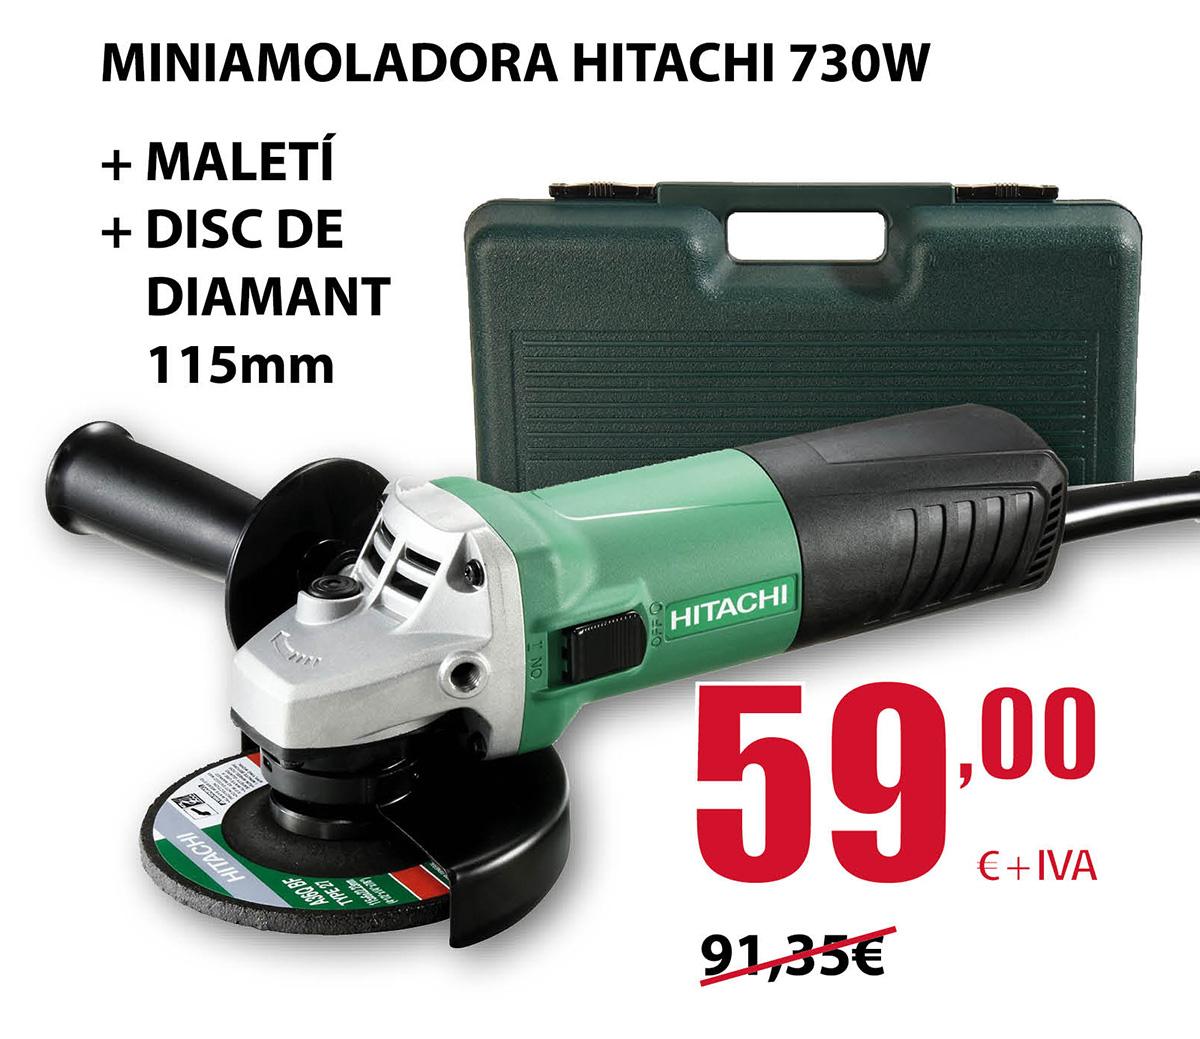 oferta miniamoladora hitachi 730w en terrassa